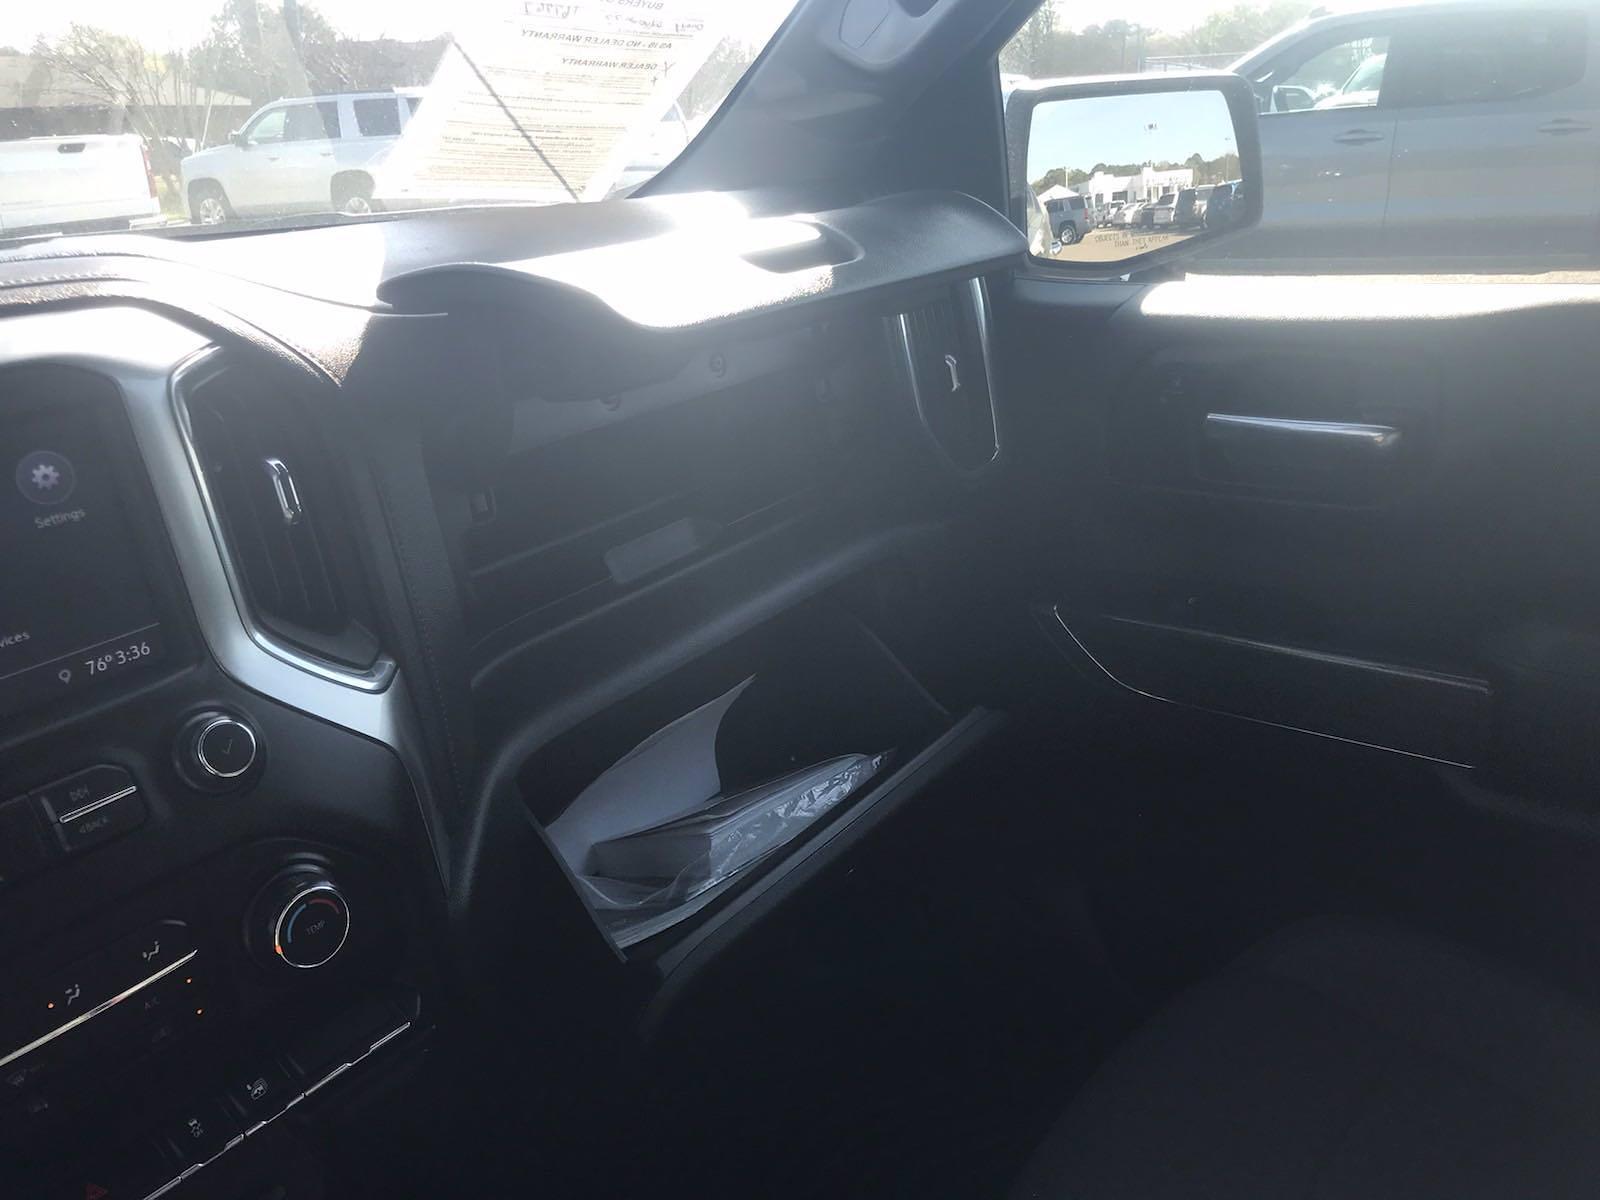 2020 Chevrolet Silverado 1500 Crew Cab 4x4, Pickup #16465P - photo 34